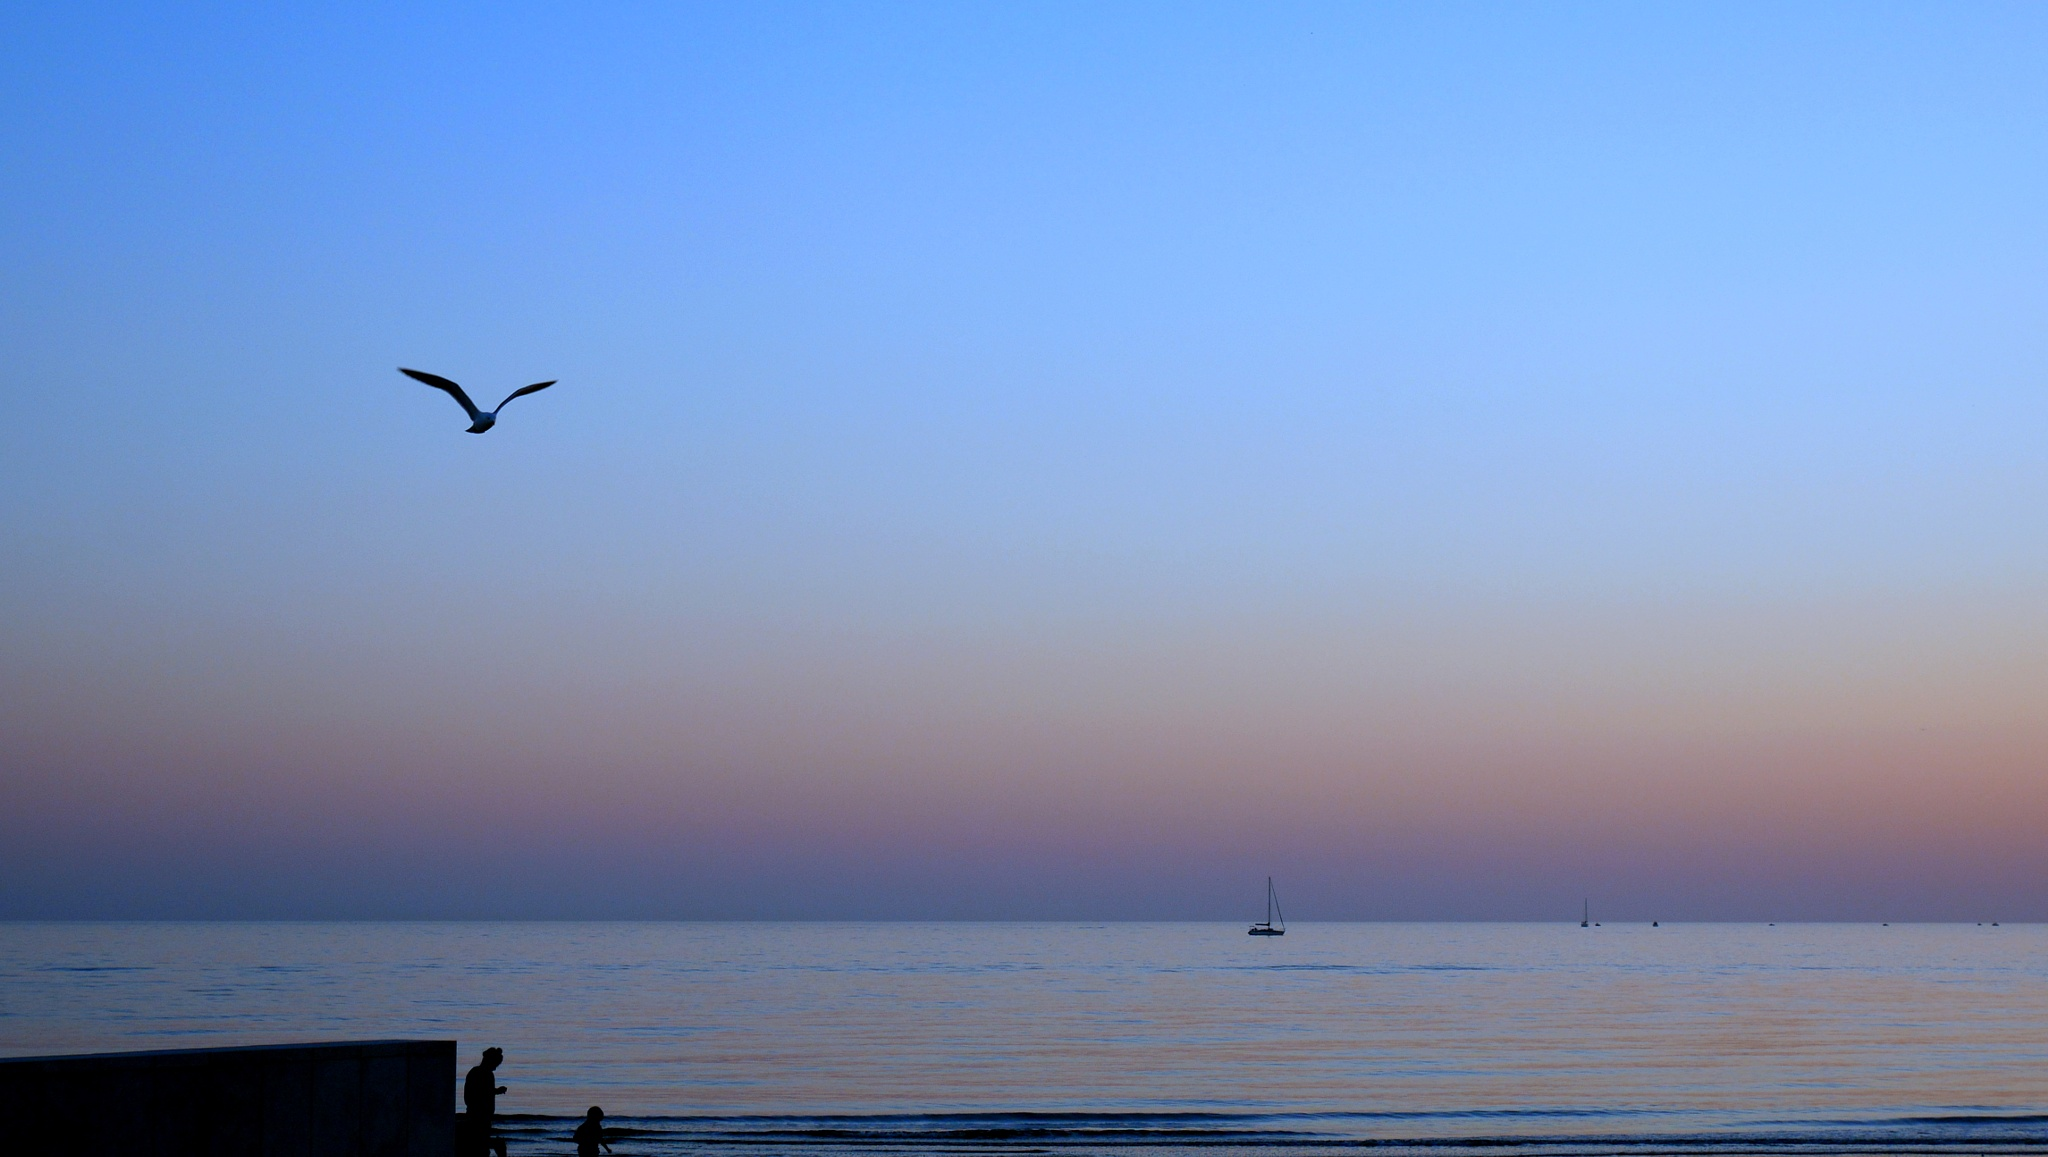 seagull by alain michel